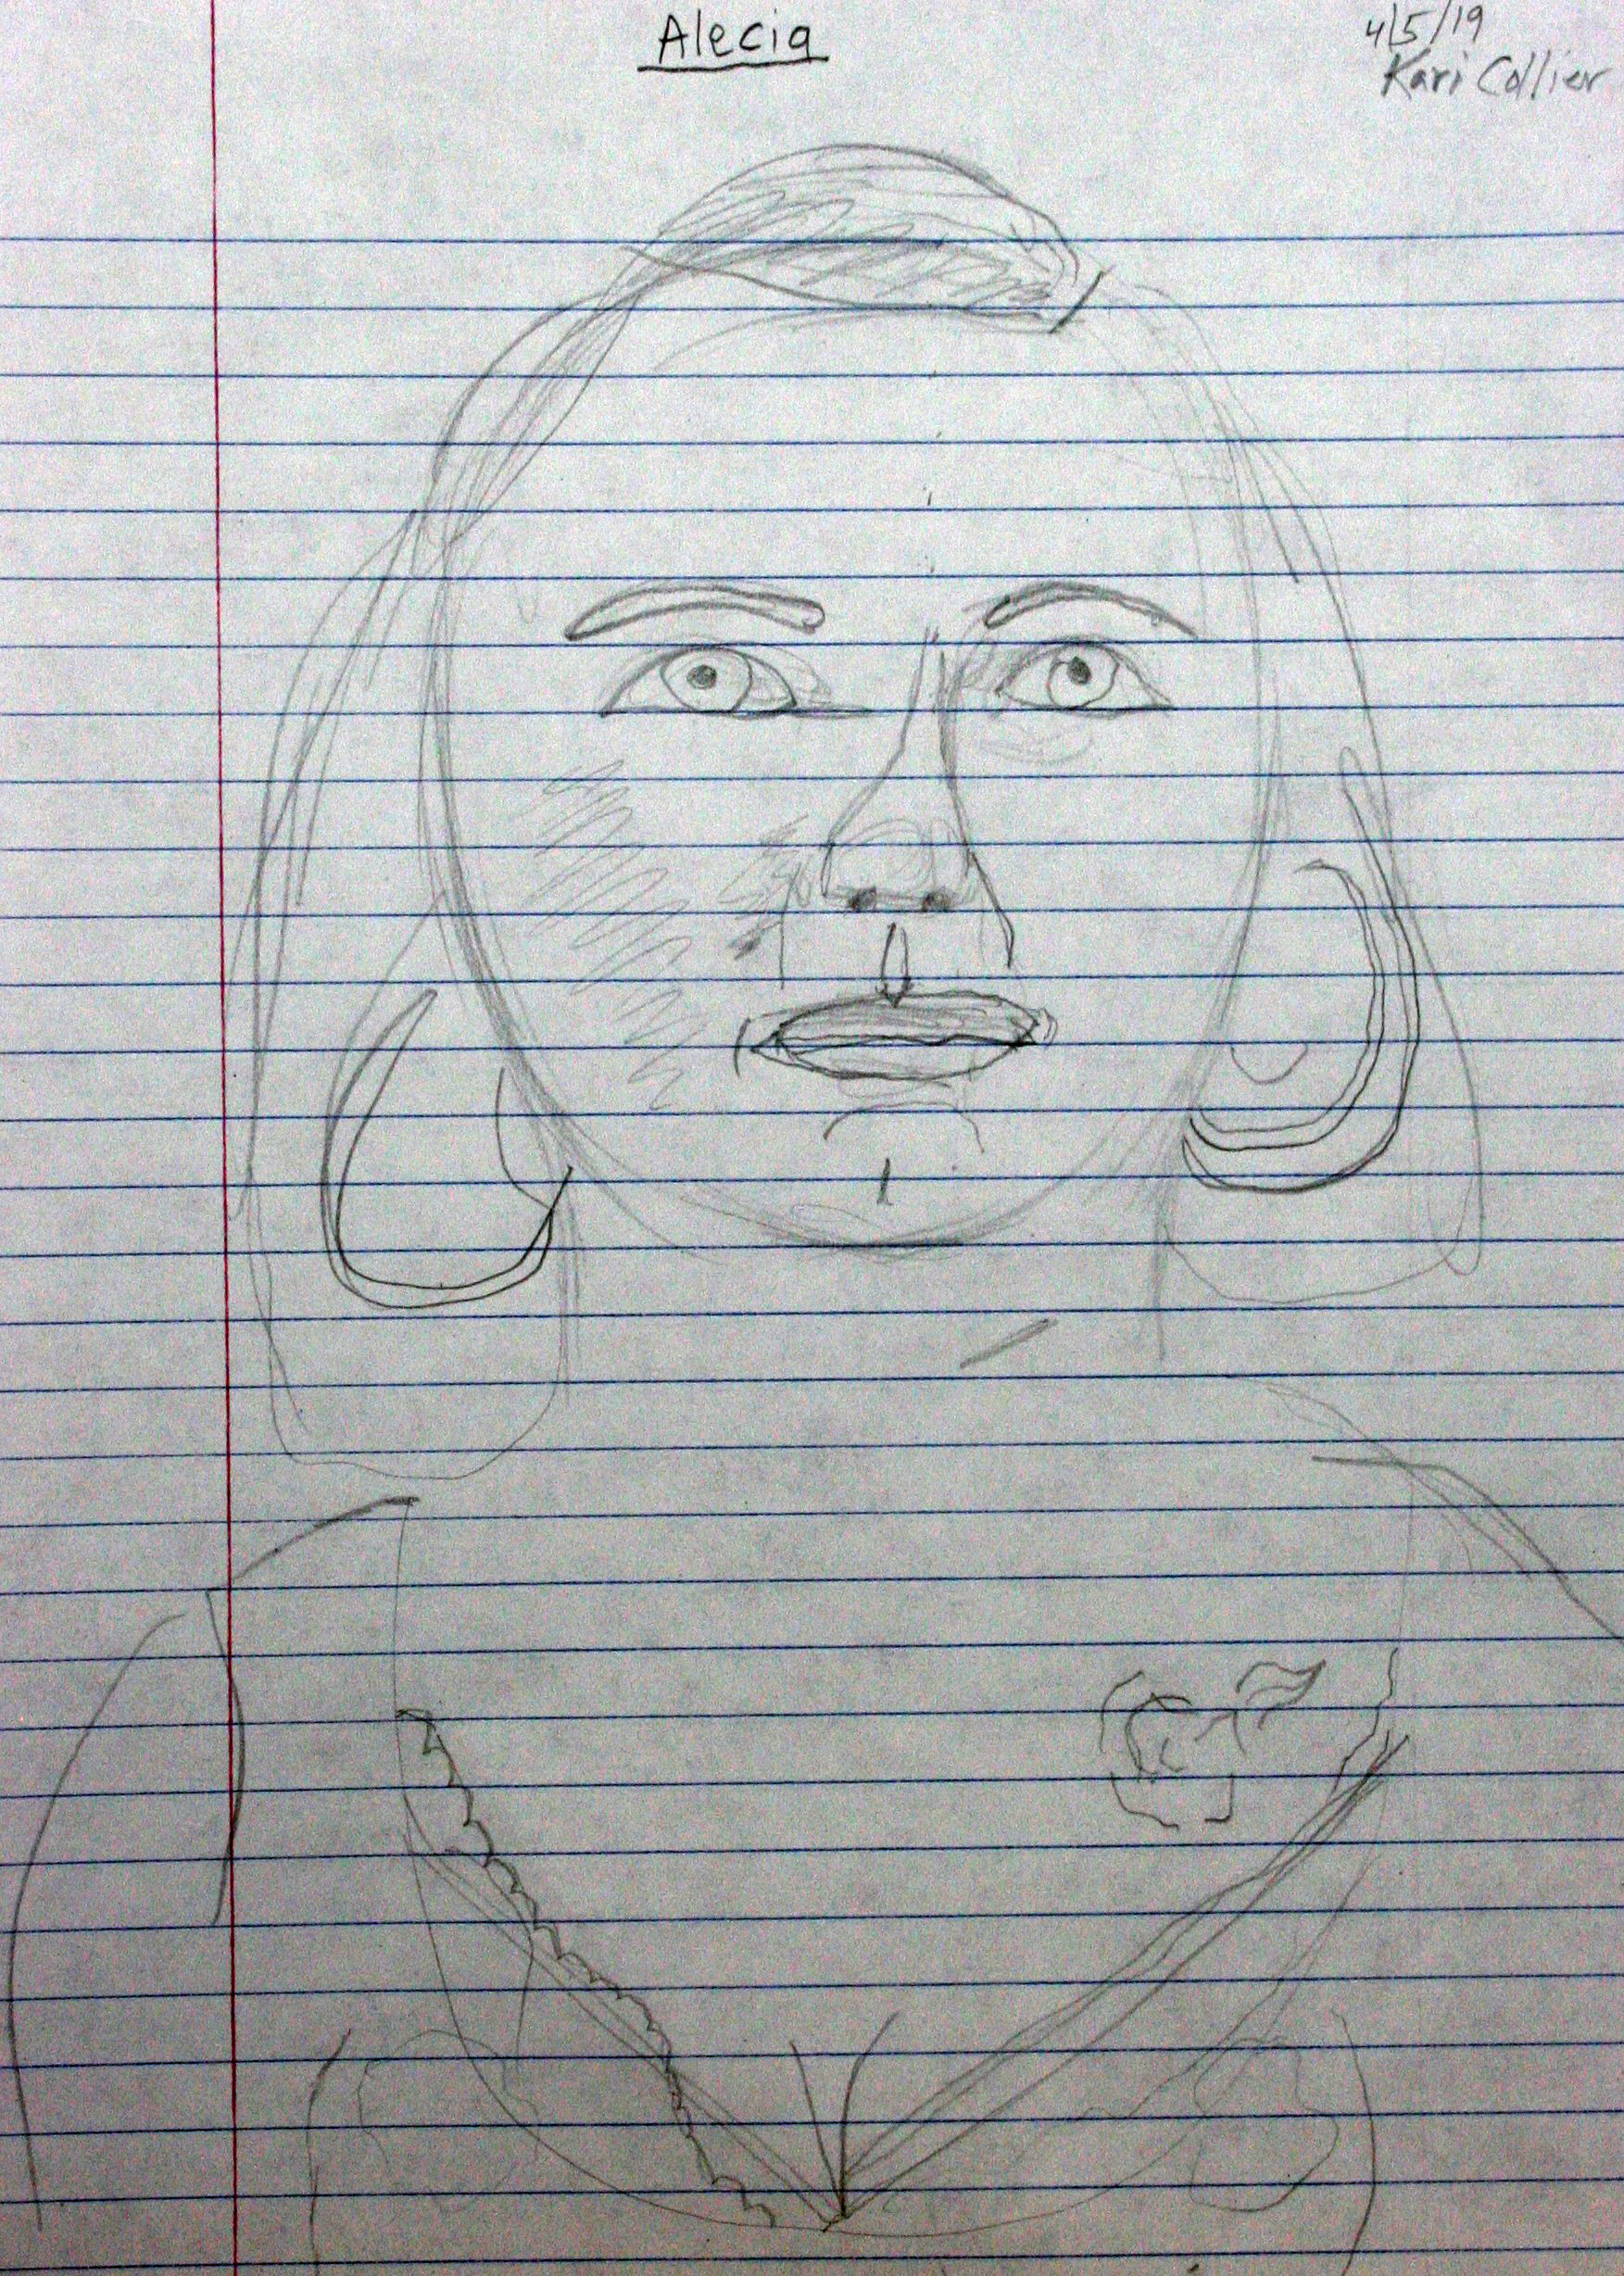 Kari Collier did this drawing.